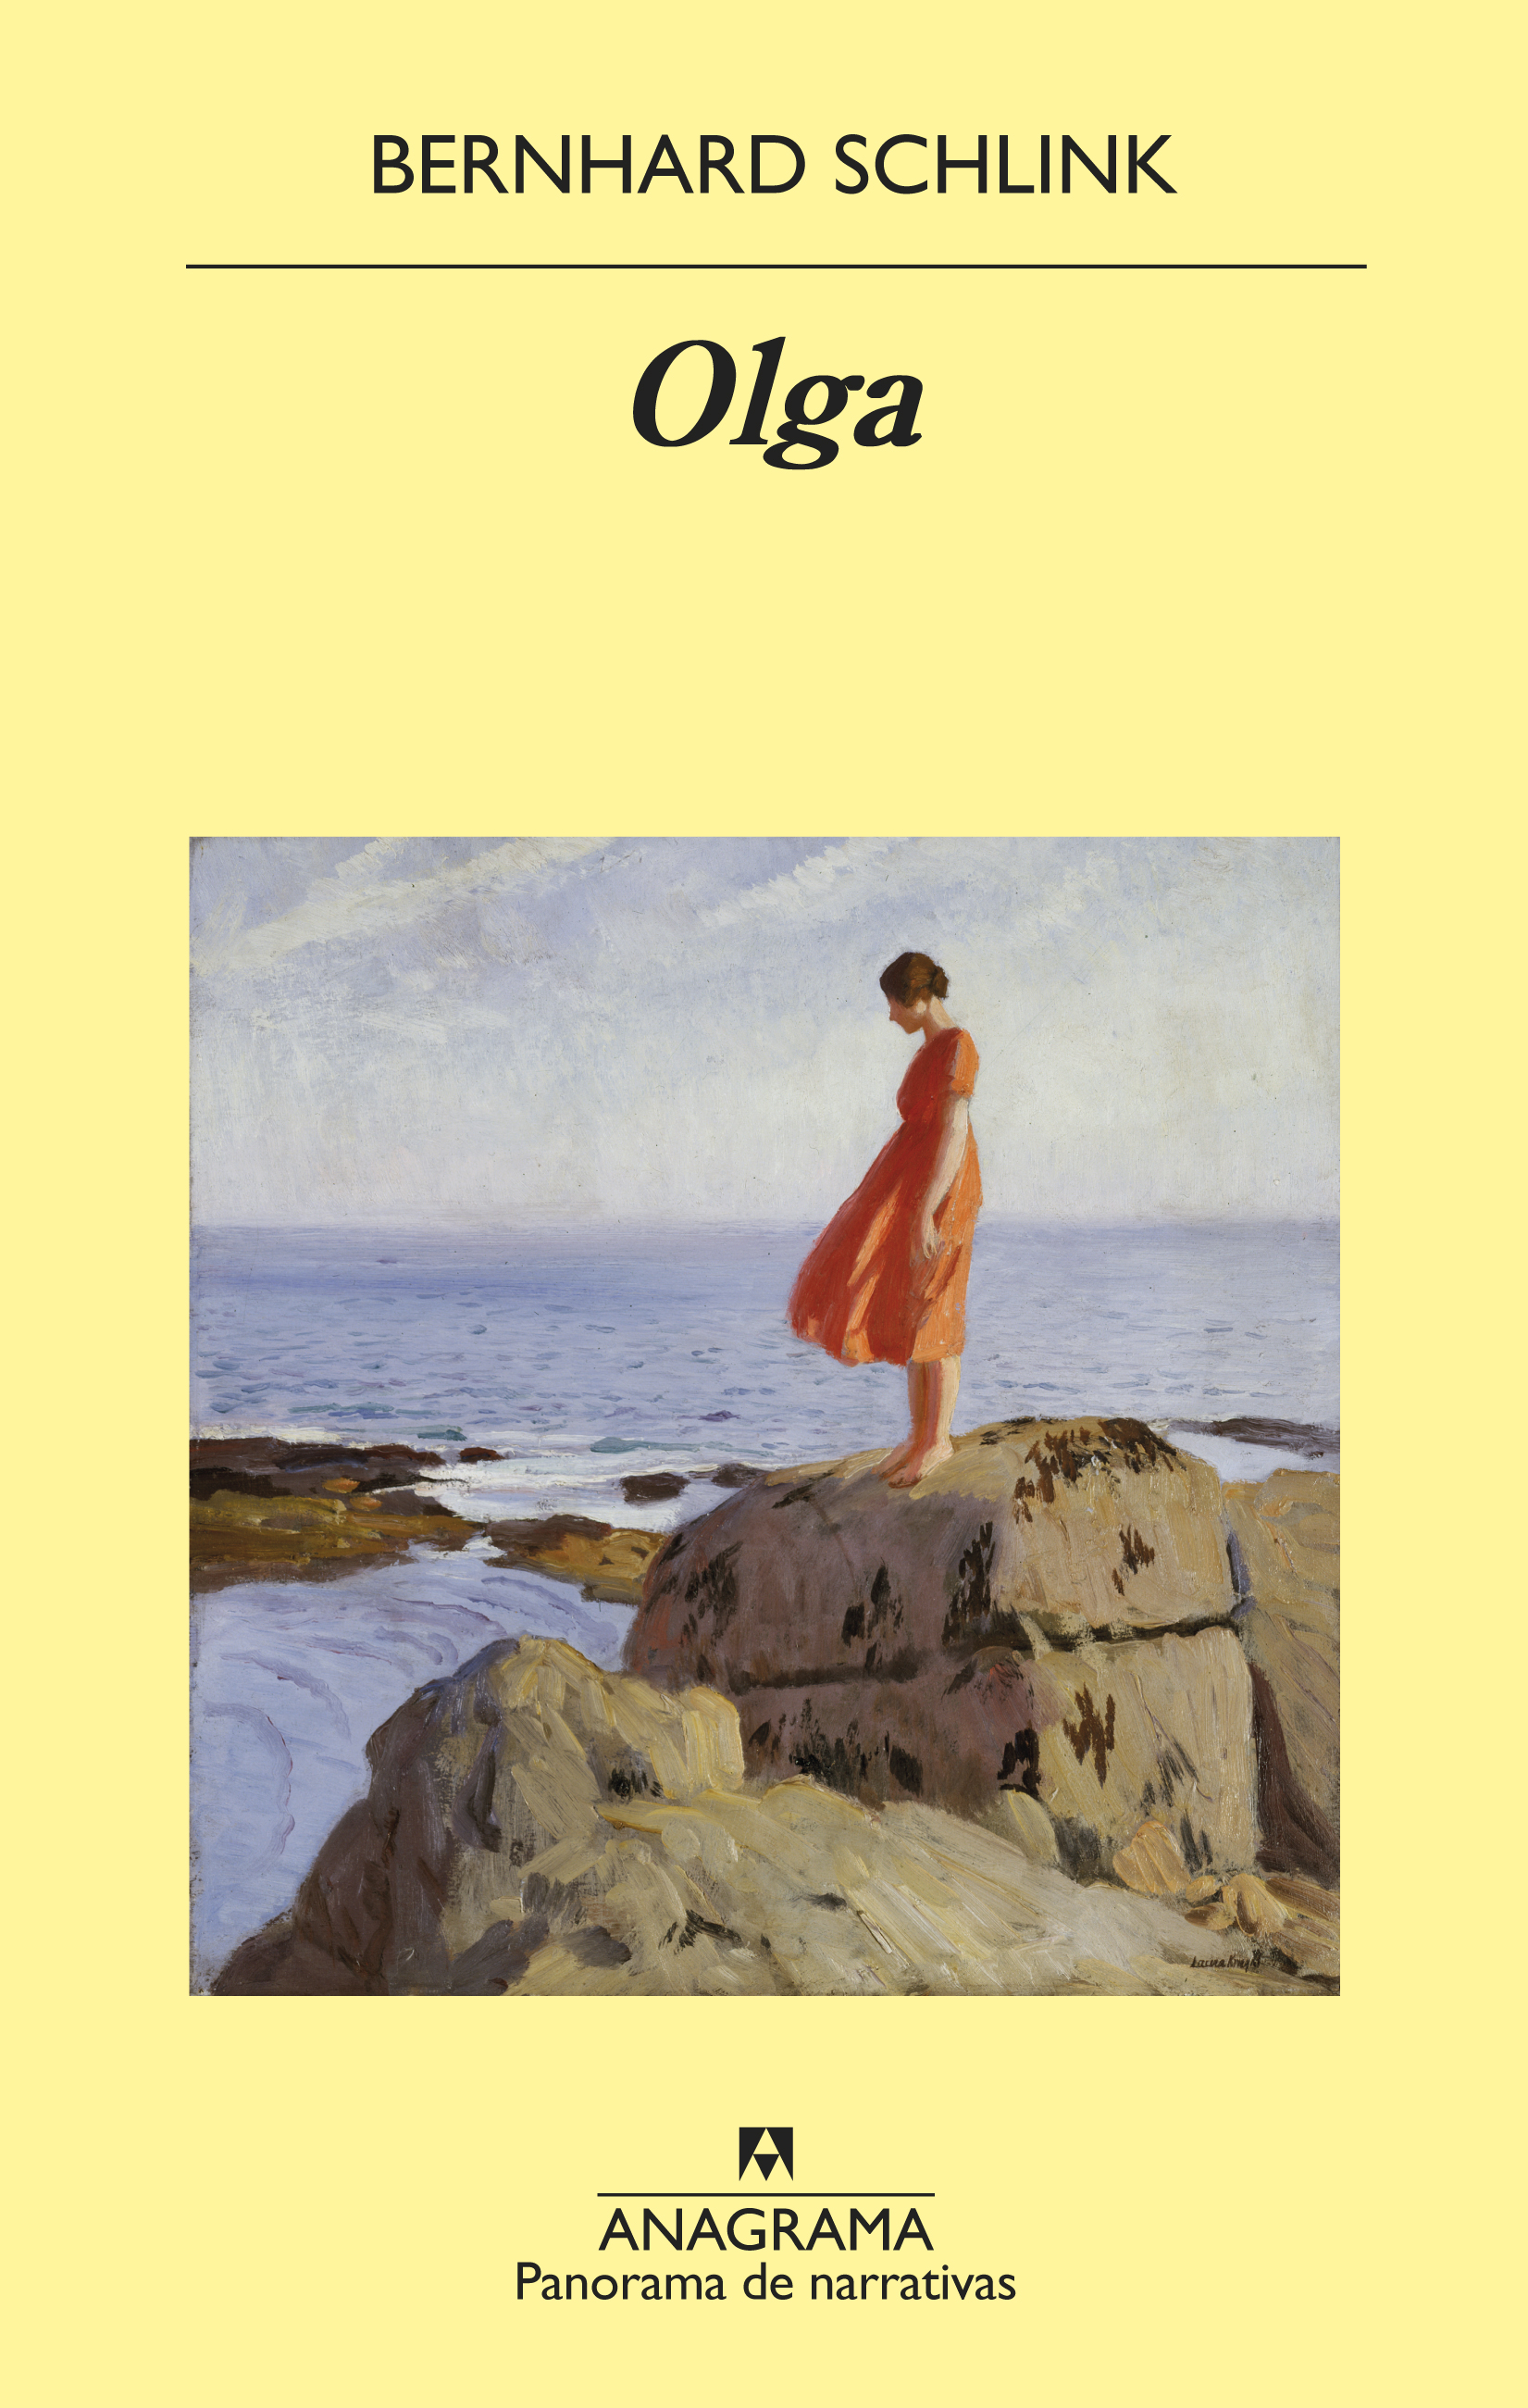 Olga - Schlink, Bernhard - 978-84-339-8039-7 - Editorial Anagrama